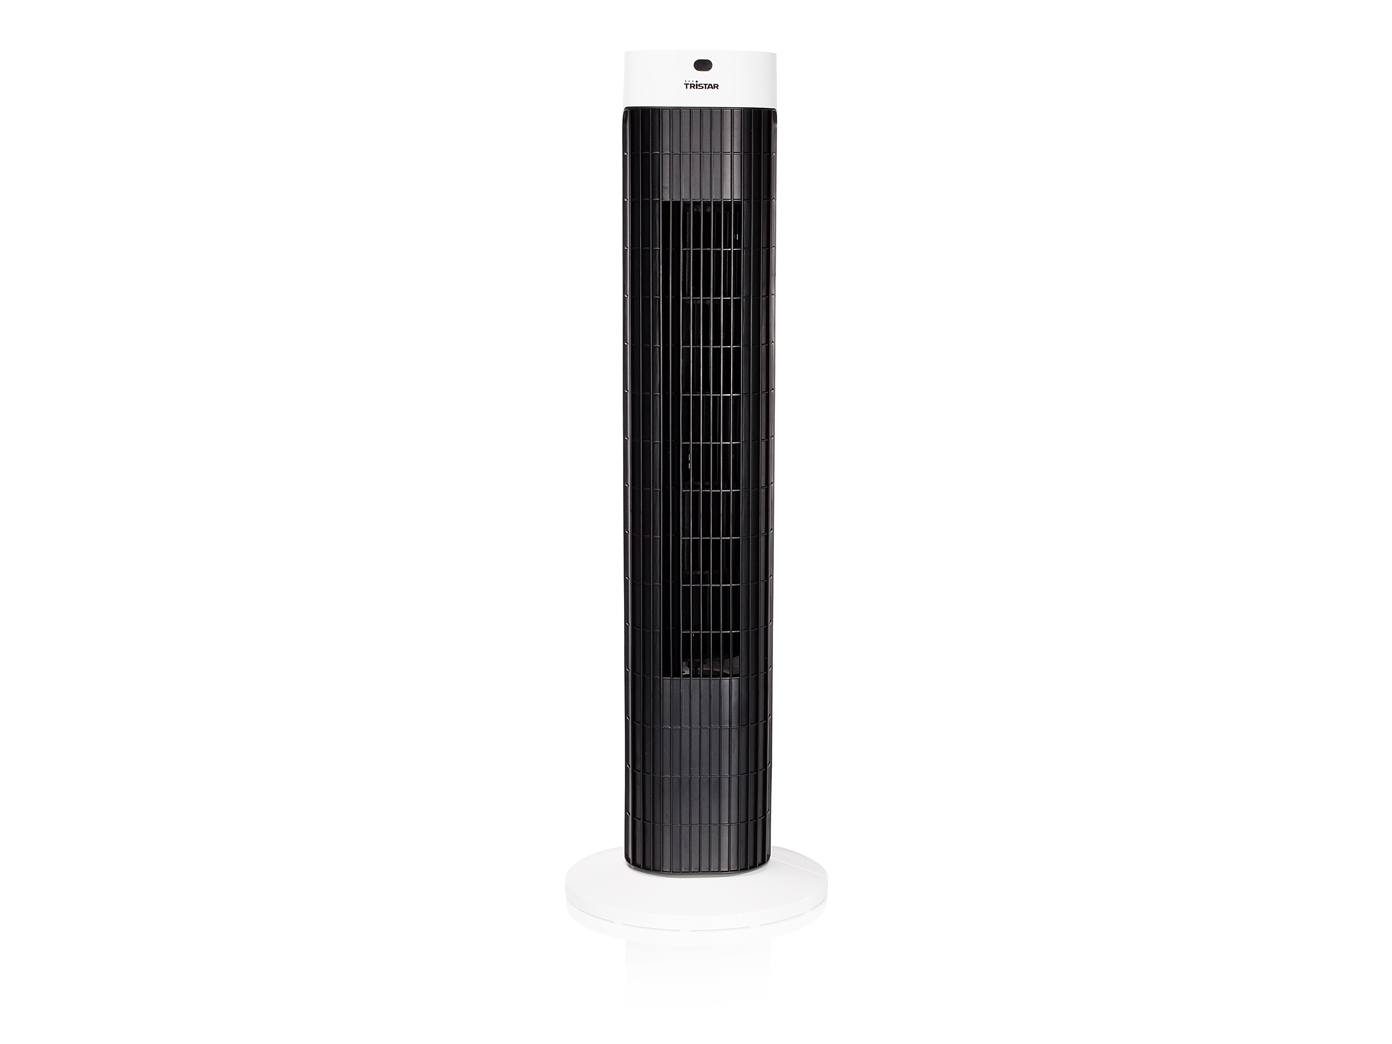 tower ventilator mit timer fernbedienung 3 stufen oszillierend turmventilator eur 49 99. Black Bedroom Furniture Sets. Home Design Ideas